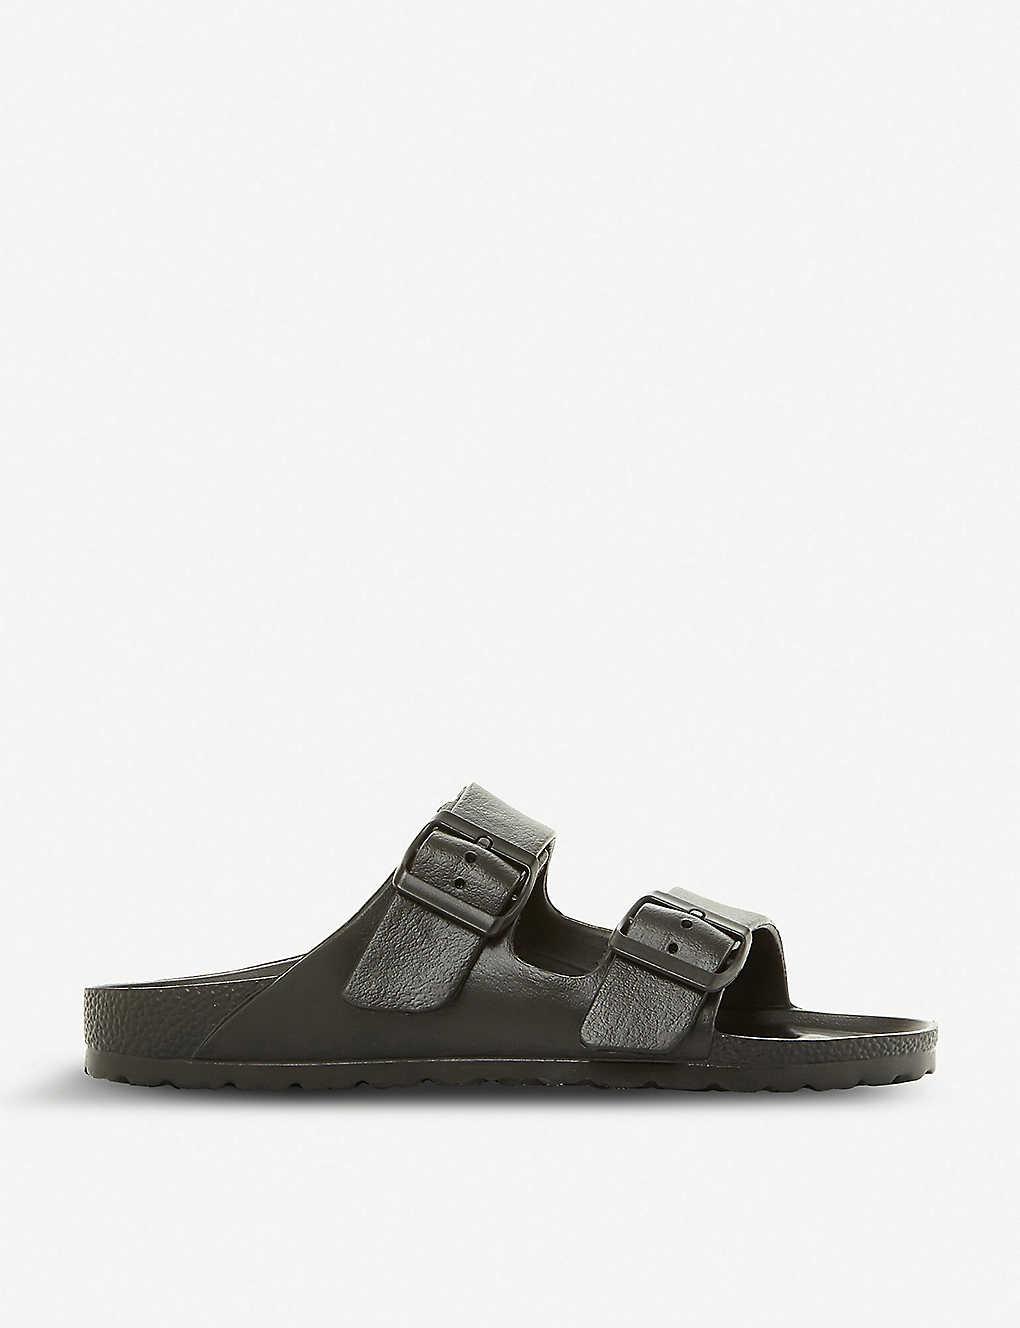 7aa47dda9c2 STEVE MADDEN - Bubbles SM buckled sandals